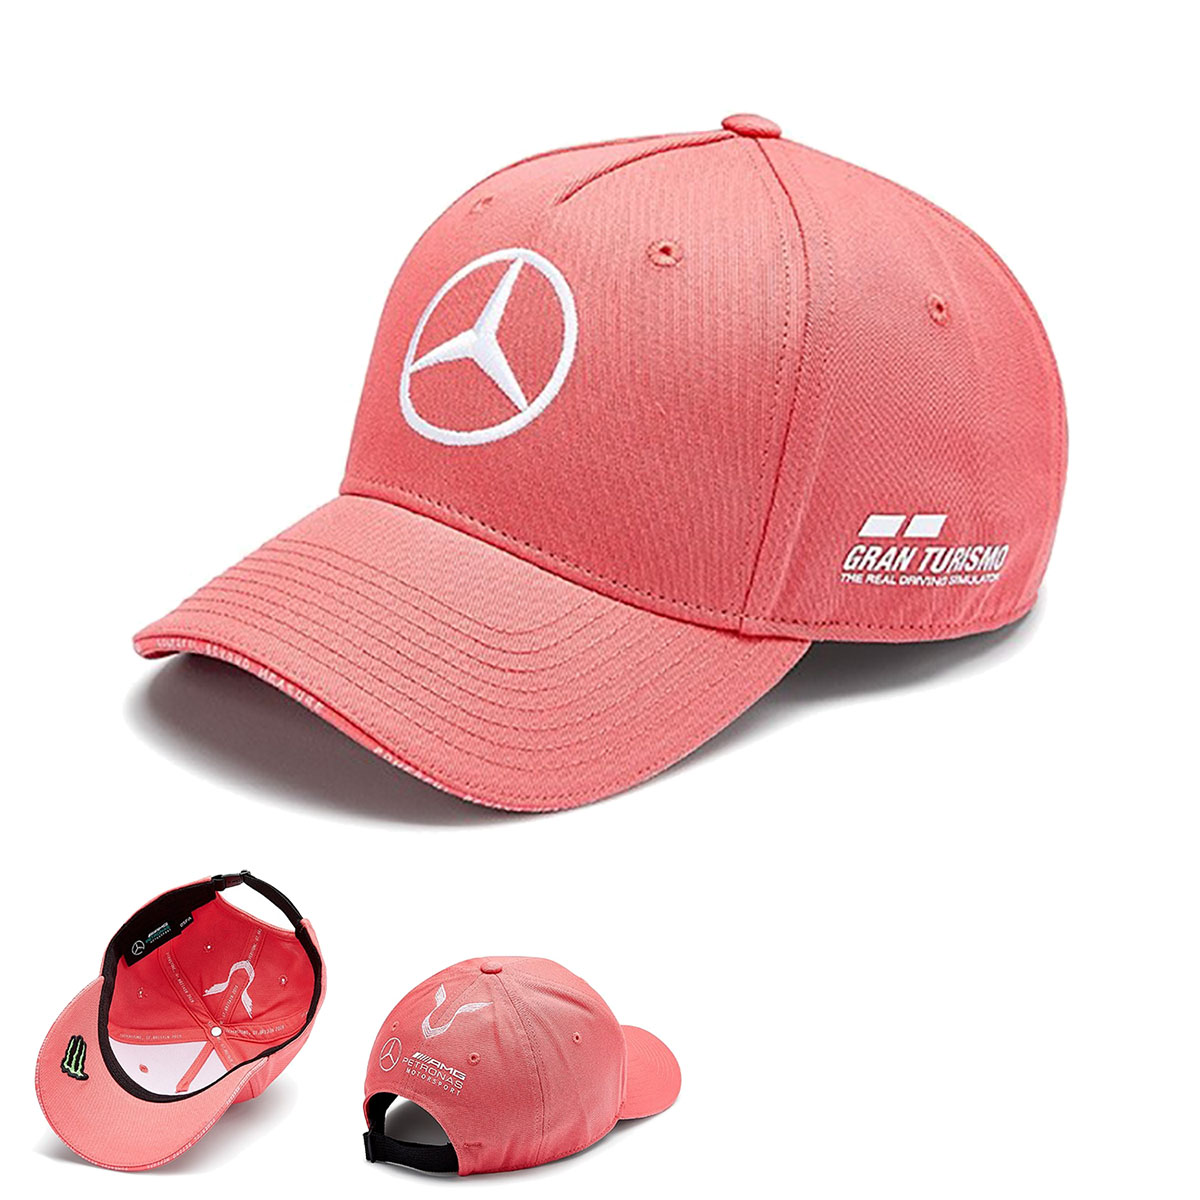 Lewis Hamilton Silverstone Kids Cap British Grand Prix 2019 Red Special  Edition   Caps & Hats   TIFOSO   F1 MERCHANDISE   F1 STORE